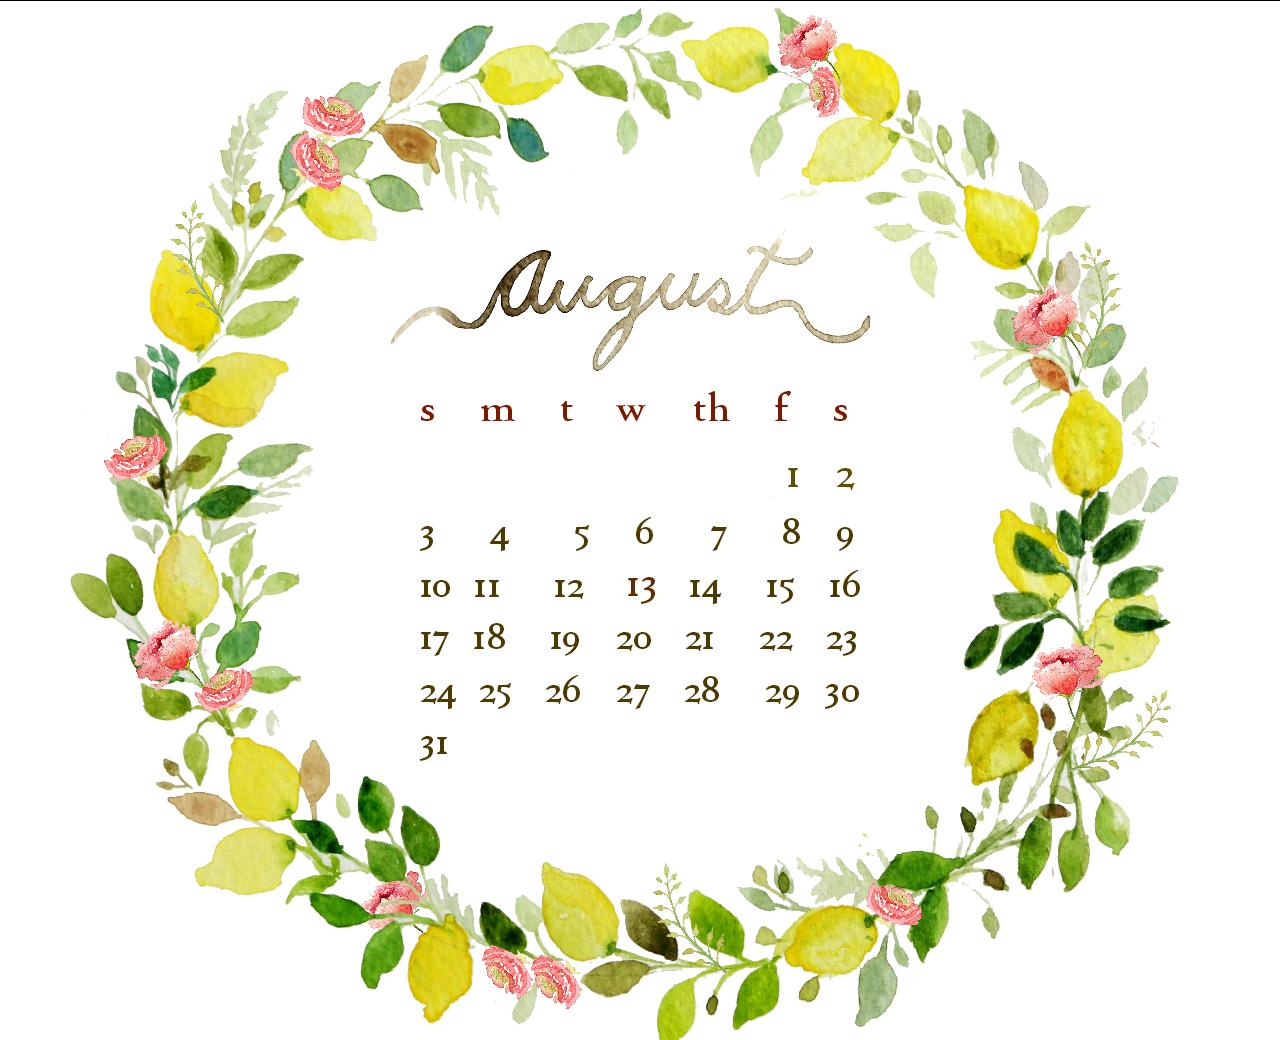 Watercolor Desktop Wallpaper Calendar : August watercolor free desktop calendar